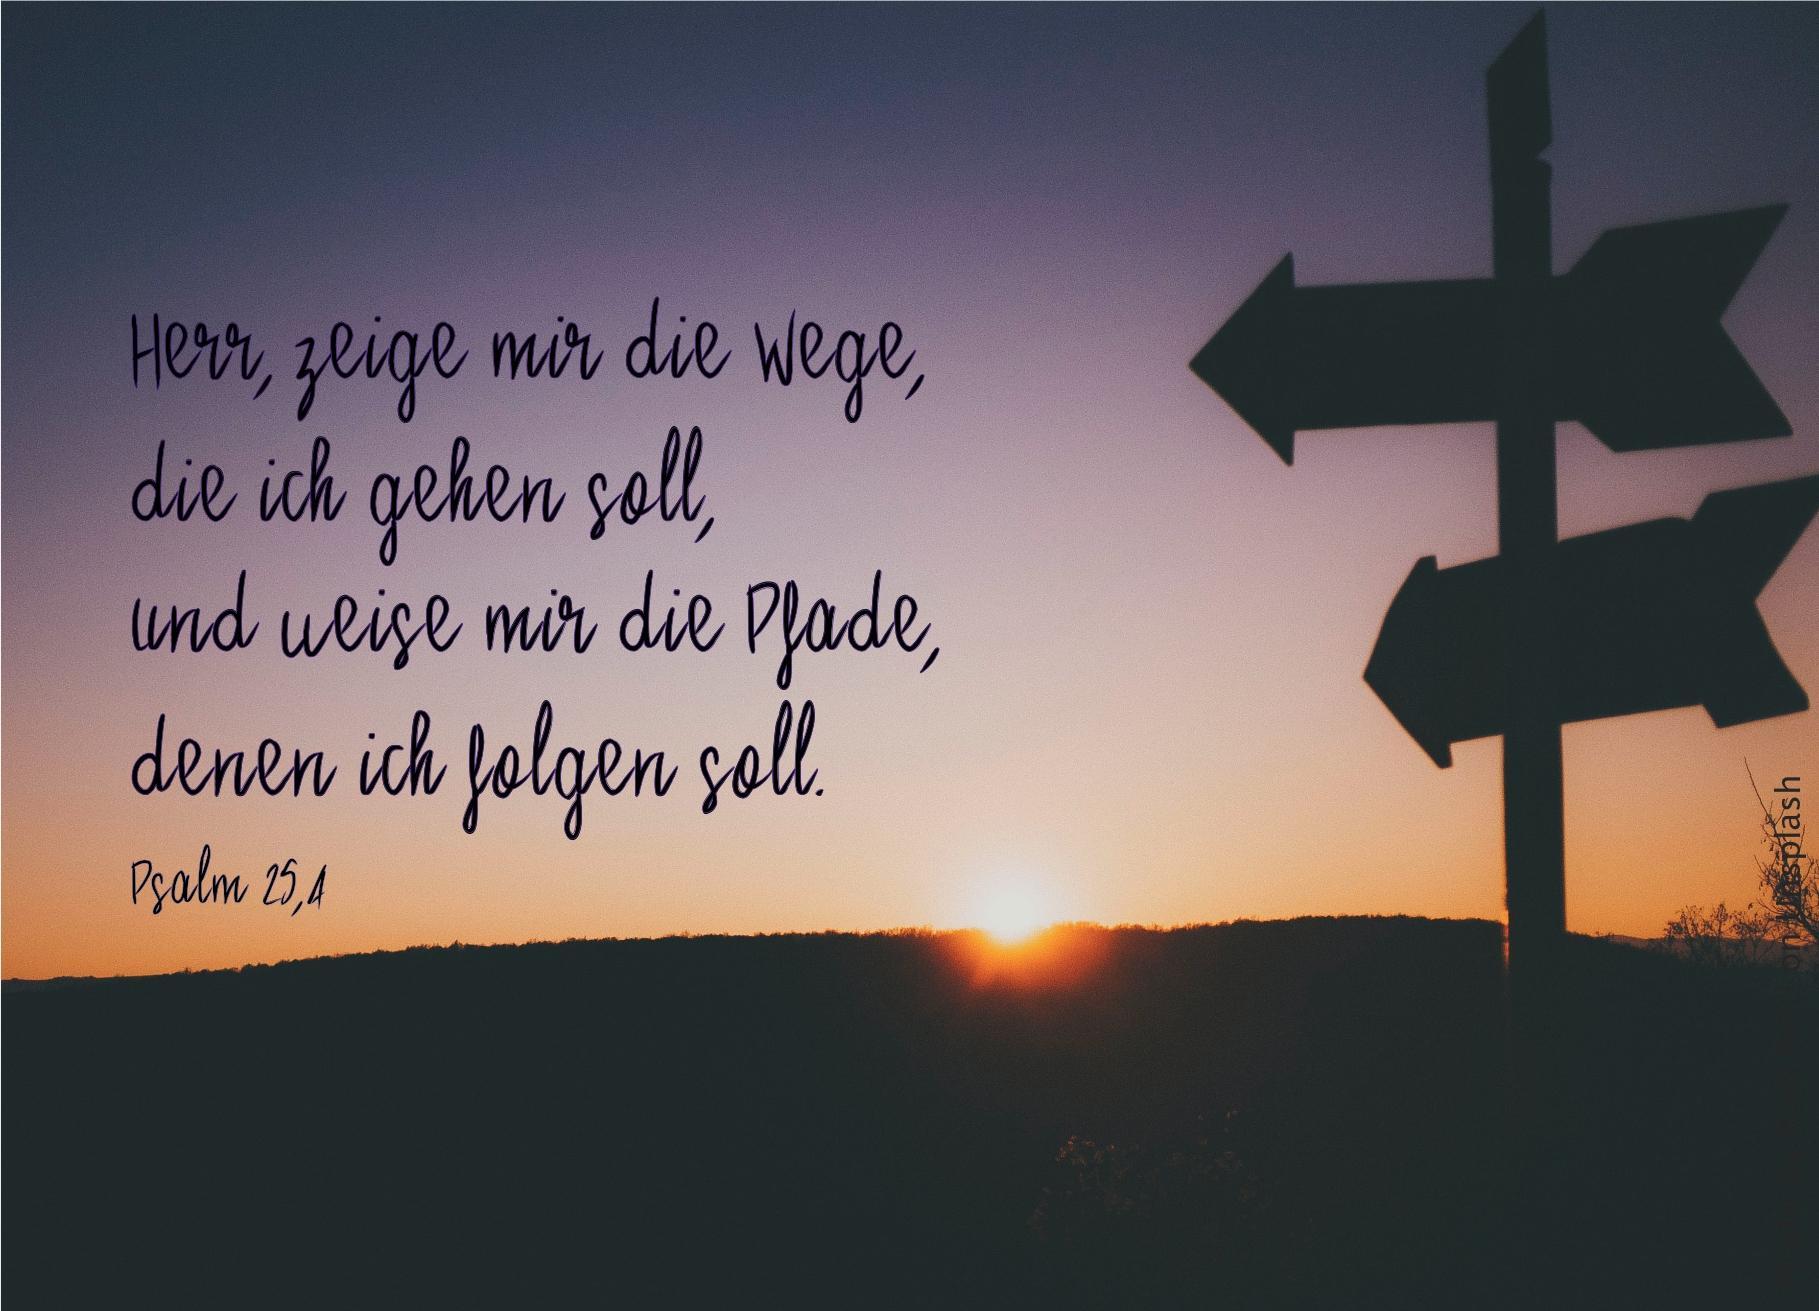 "alt=""wegweiser_vor_sonnenuntergang_erwartet_bibelhoerbuch_jesus_wird_verraten"""